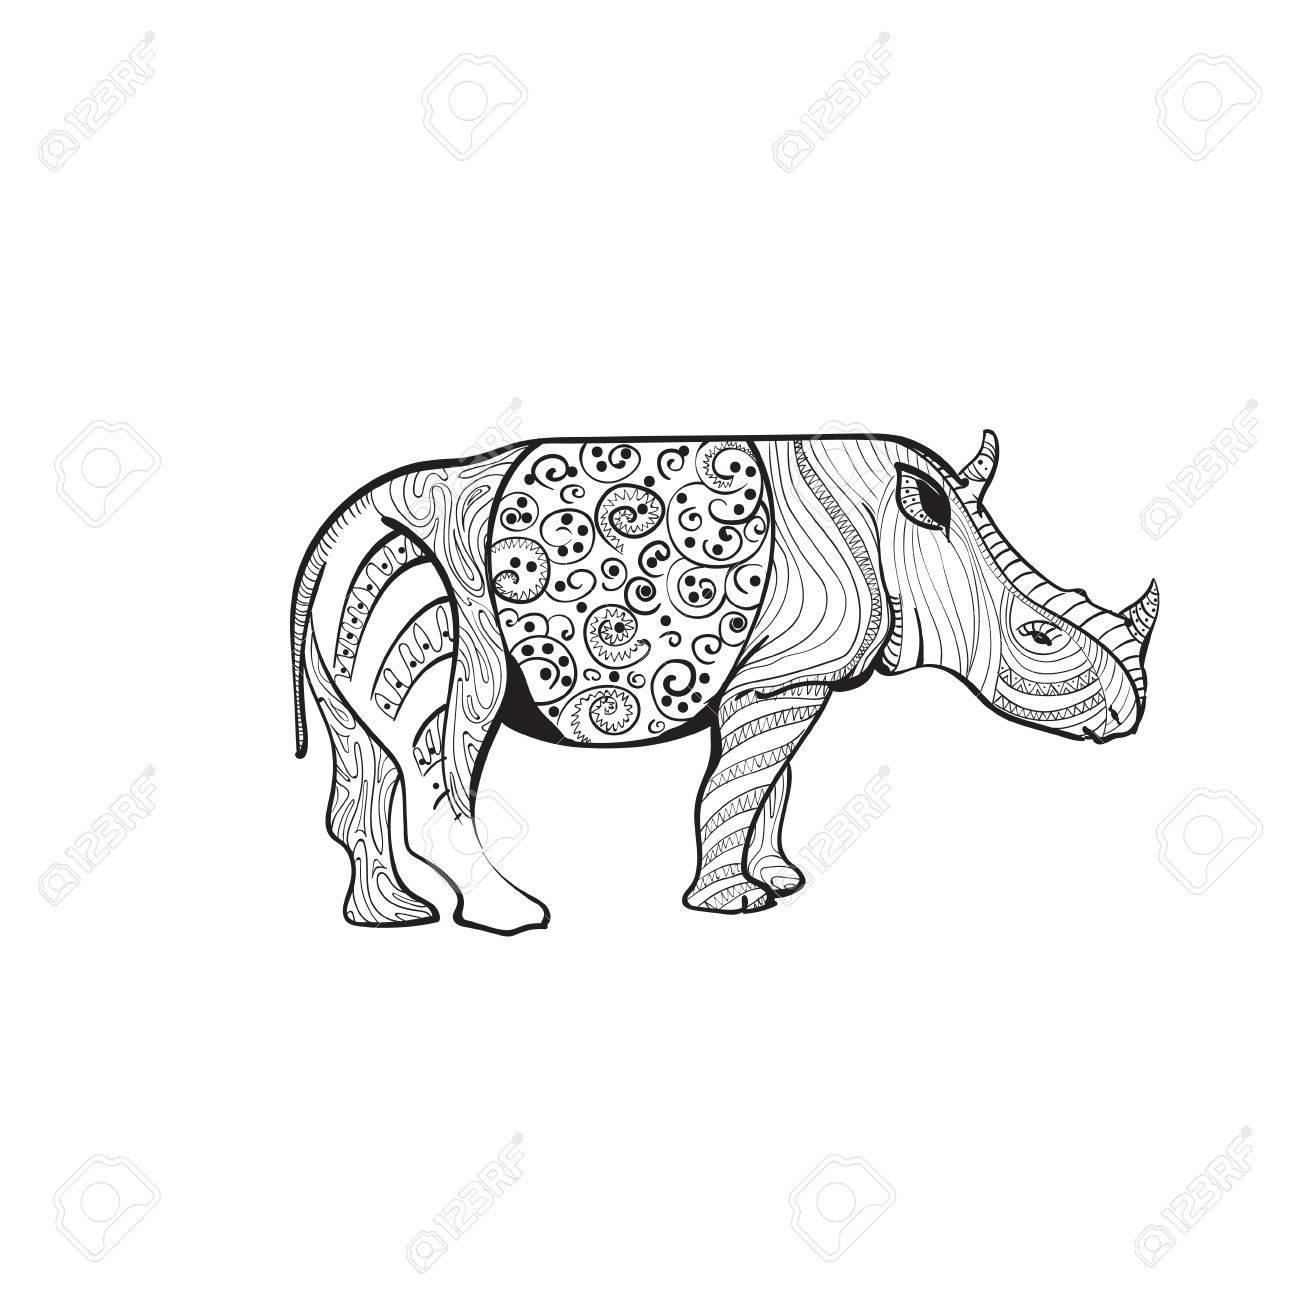 1300x1300 Rhino Drawing Zentangle Animal Full Length On White Background